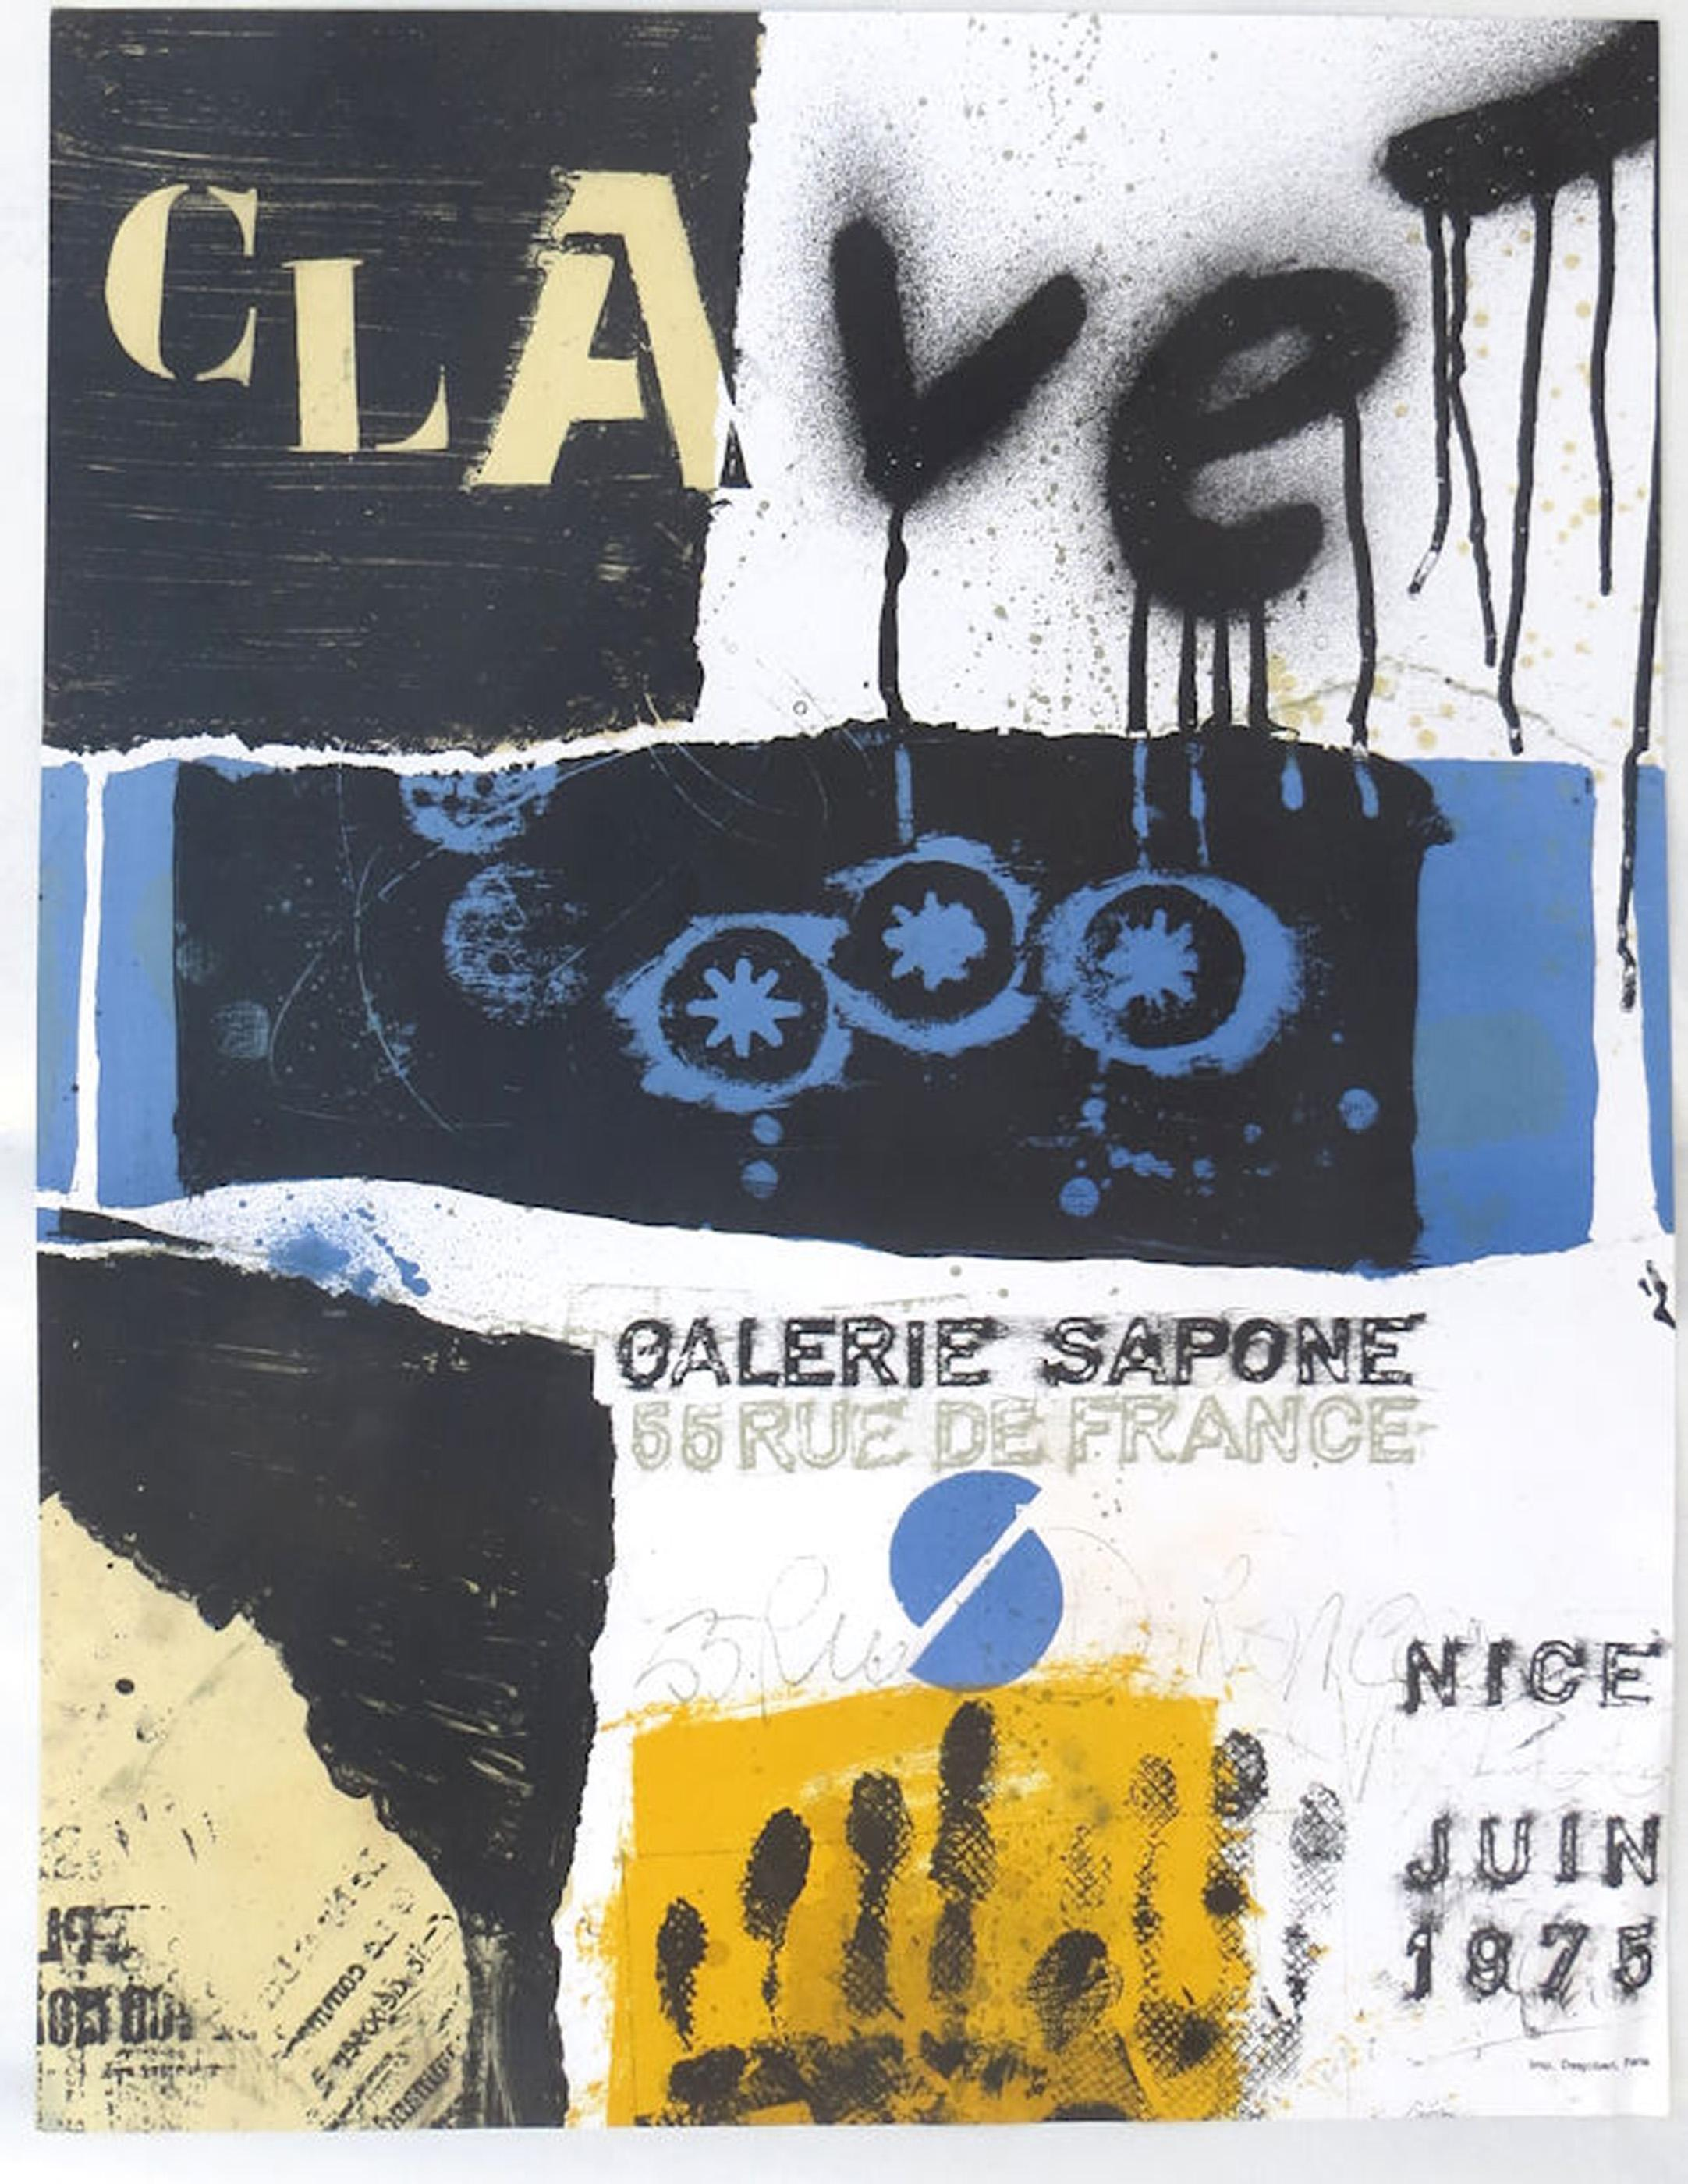 Antoni Clave, Galerie Sapone Exhibition, Lithograph Poster